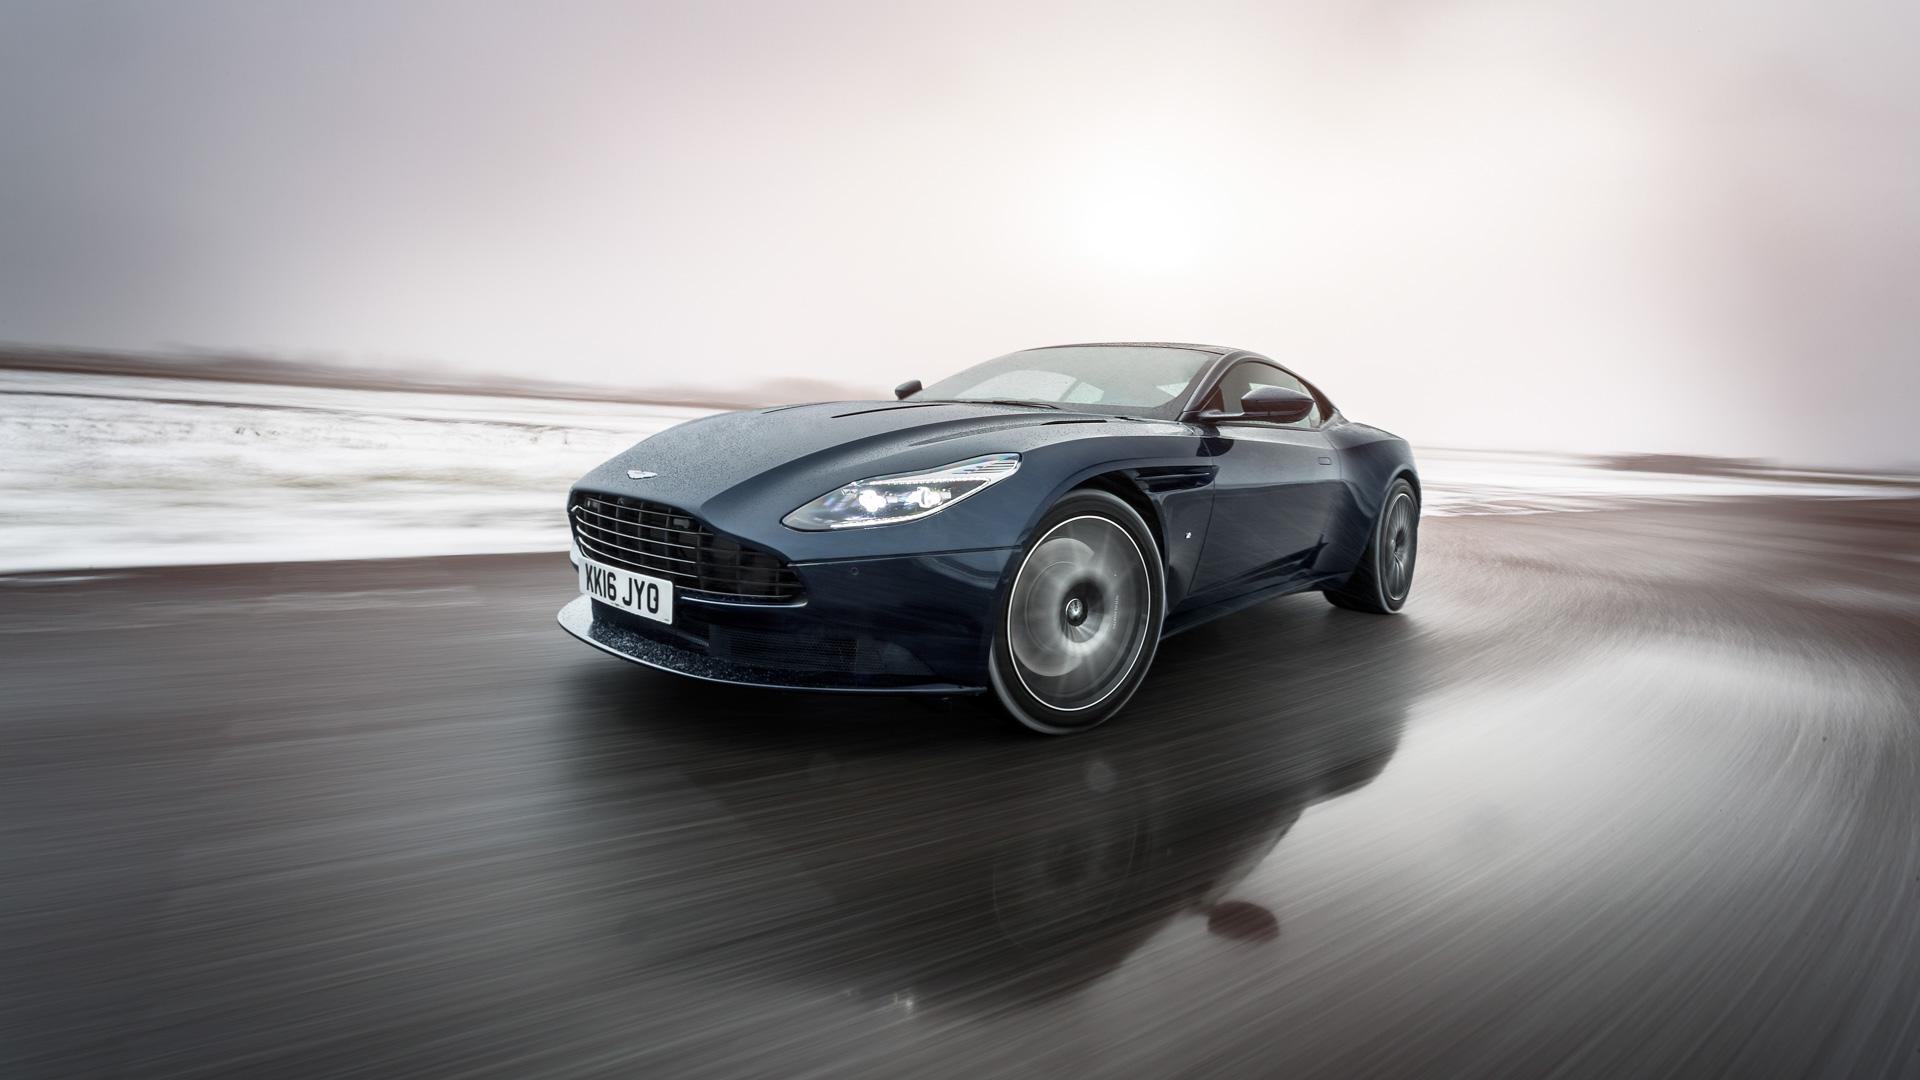 Тест-драйв мечты Джеймса Бонда: Aston Martin DB11. Фото 7